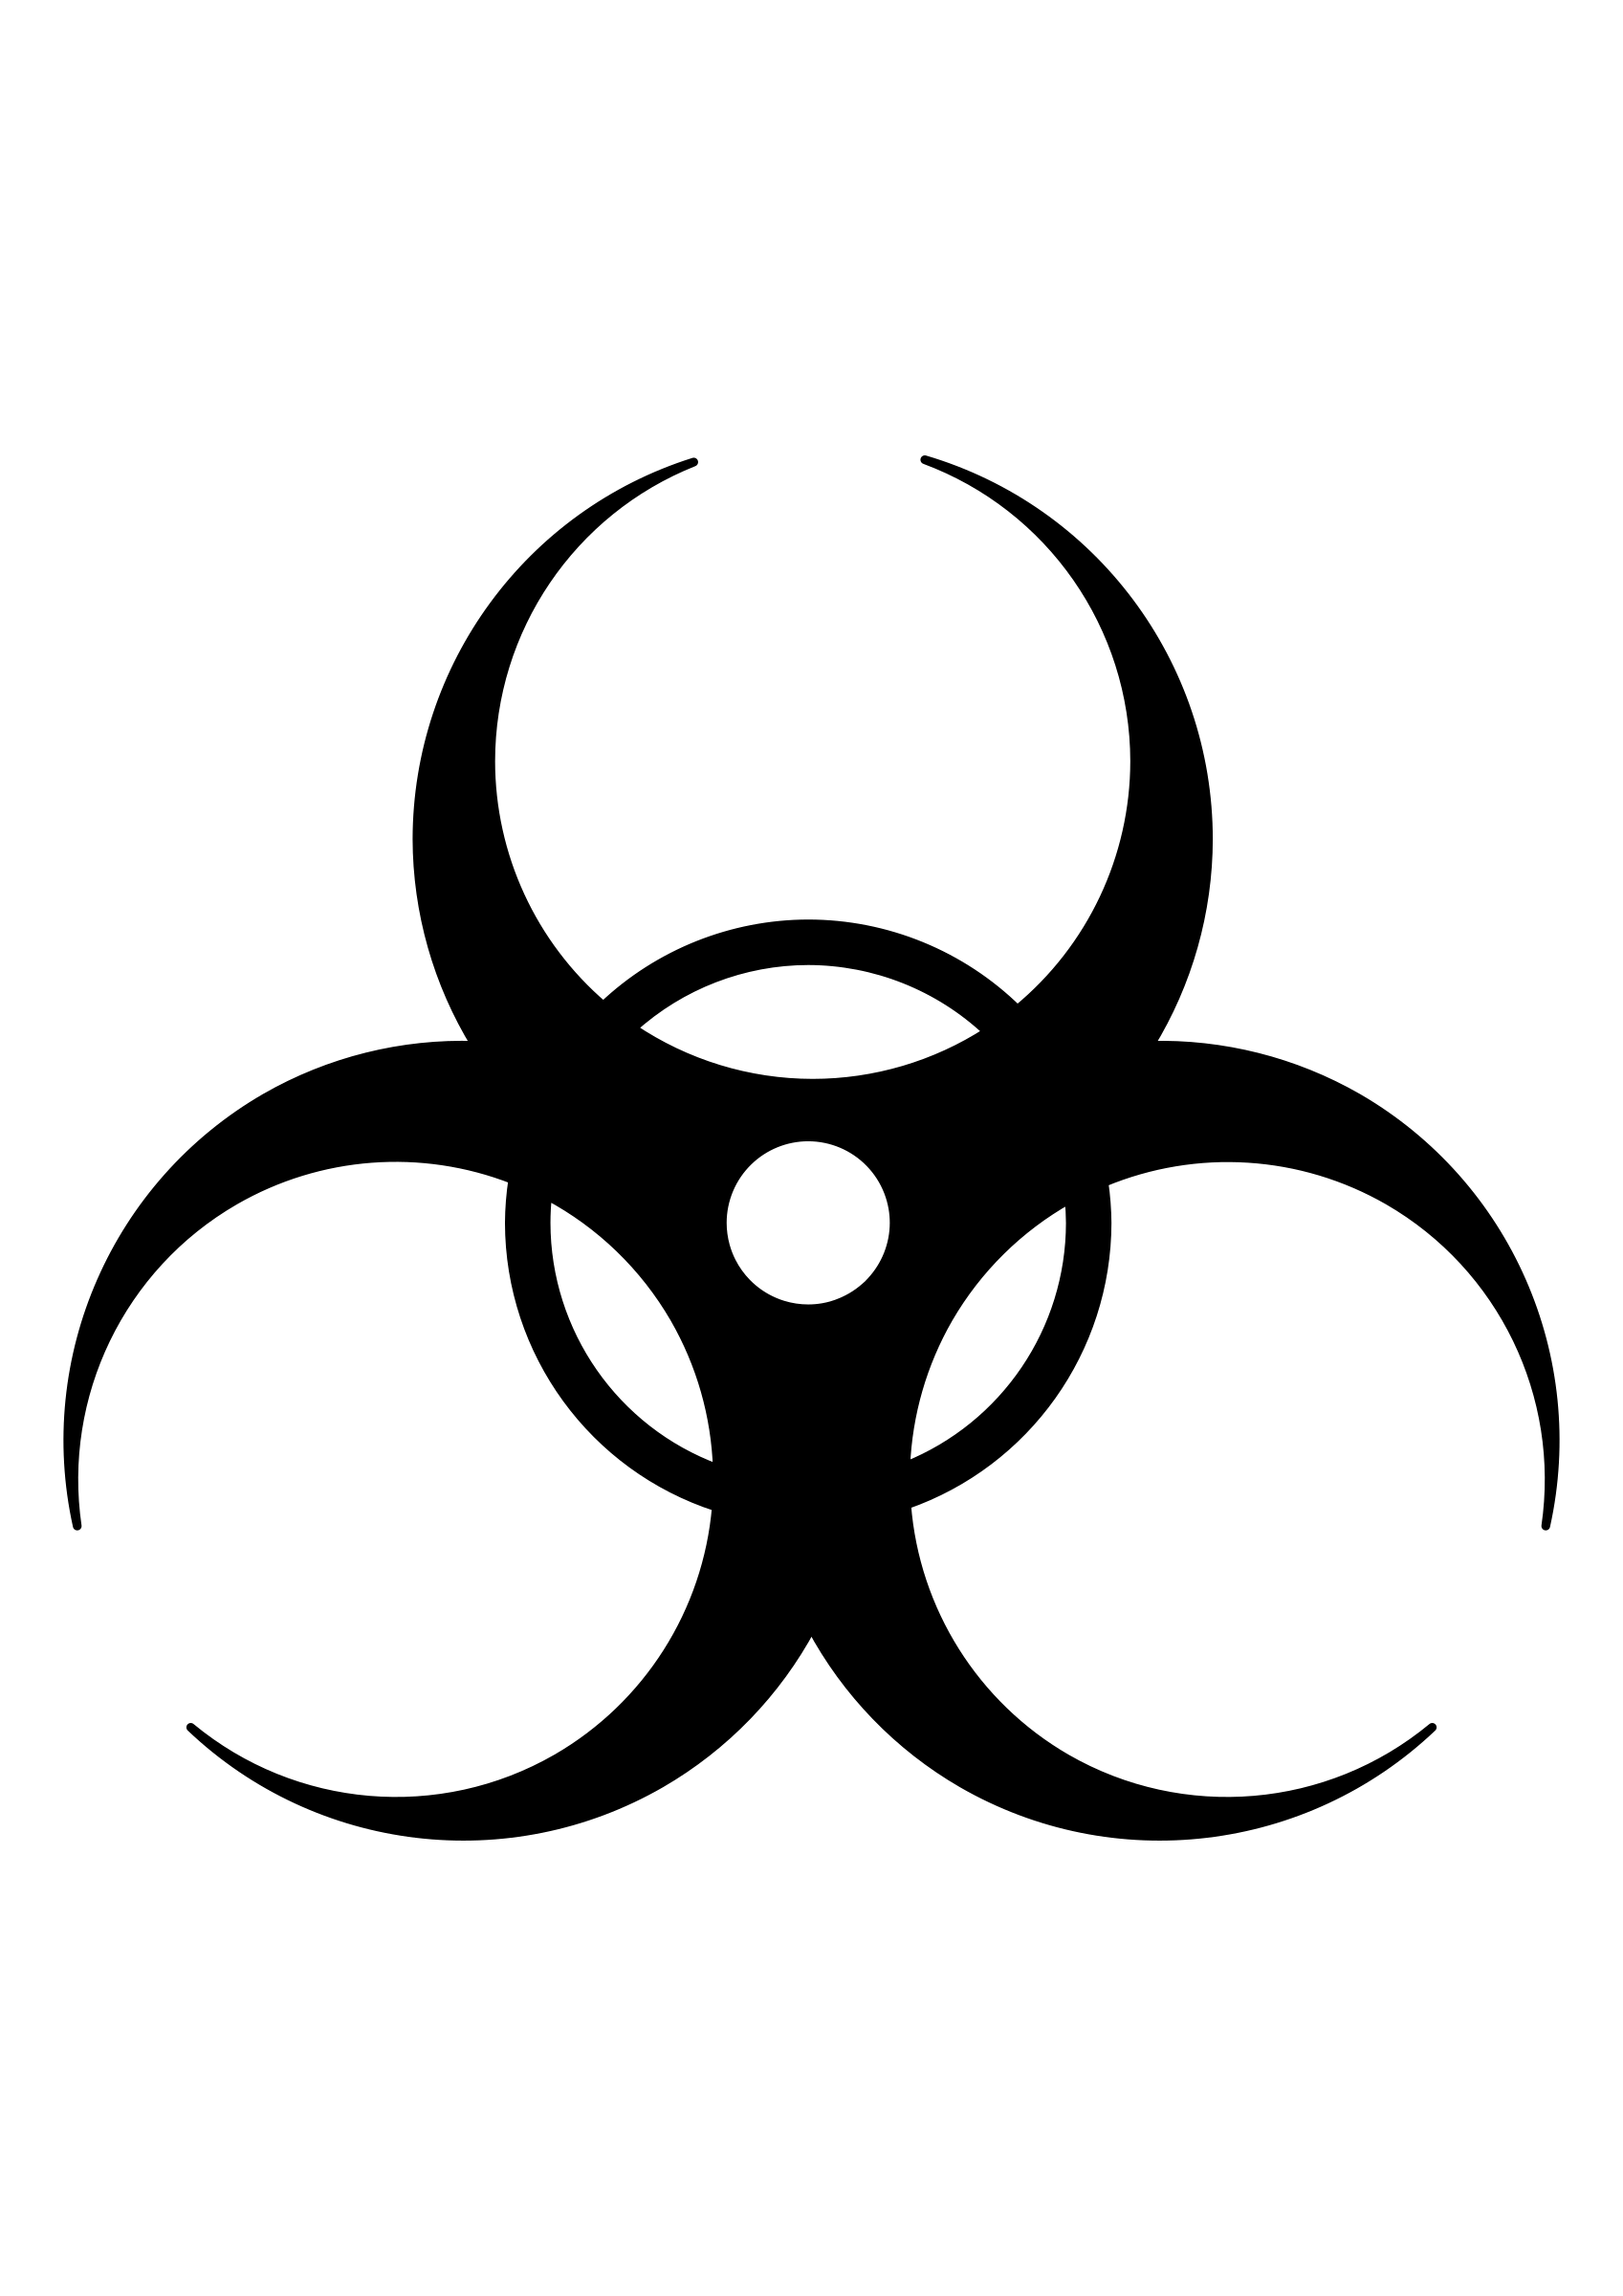 Biohazard Symbol PNG - 8698